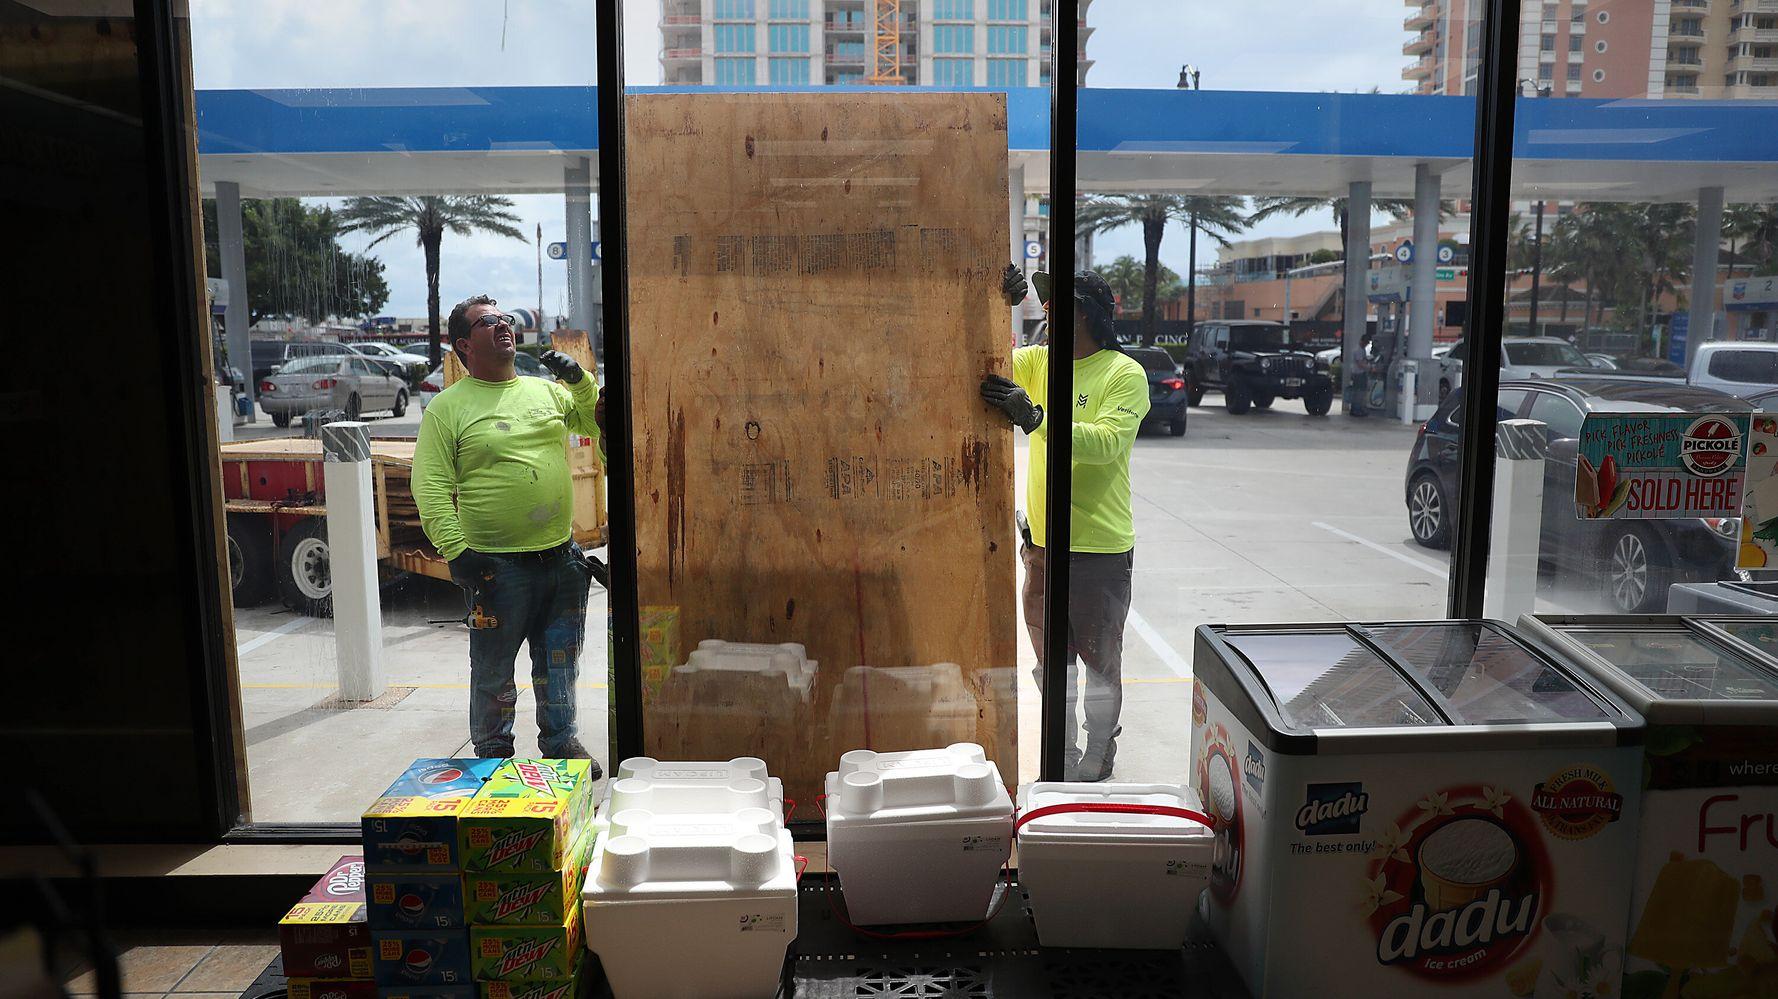 Westlake Legal Group 5d6969423c00008b0548aa78 Hurricane Dorian Strengthens To Category 3 Approaching Florida